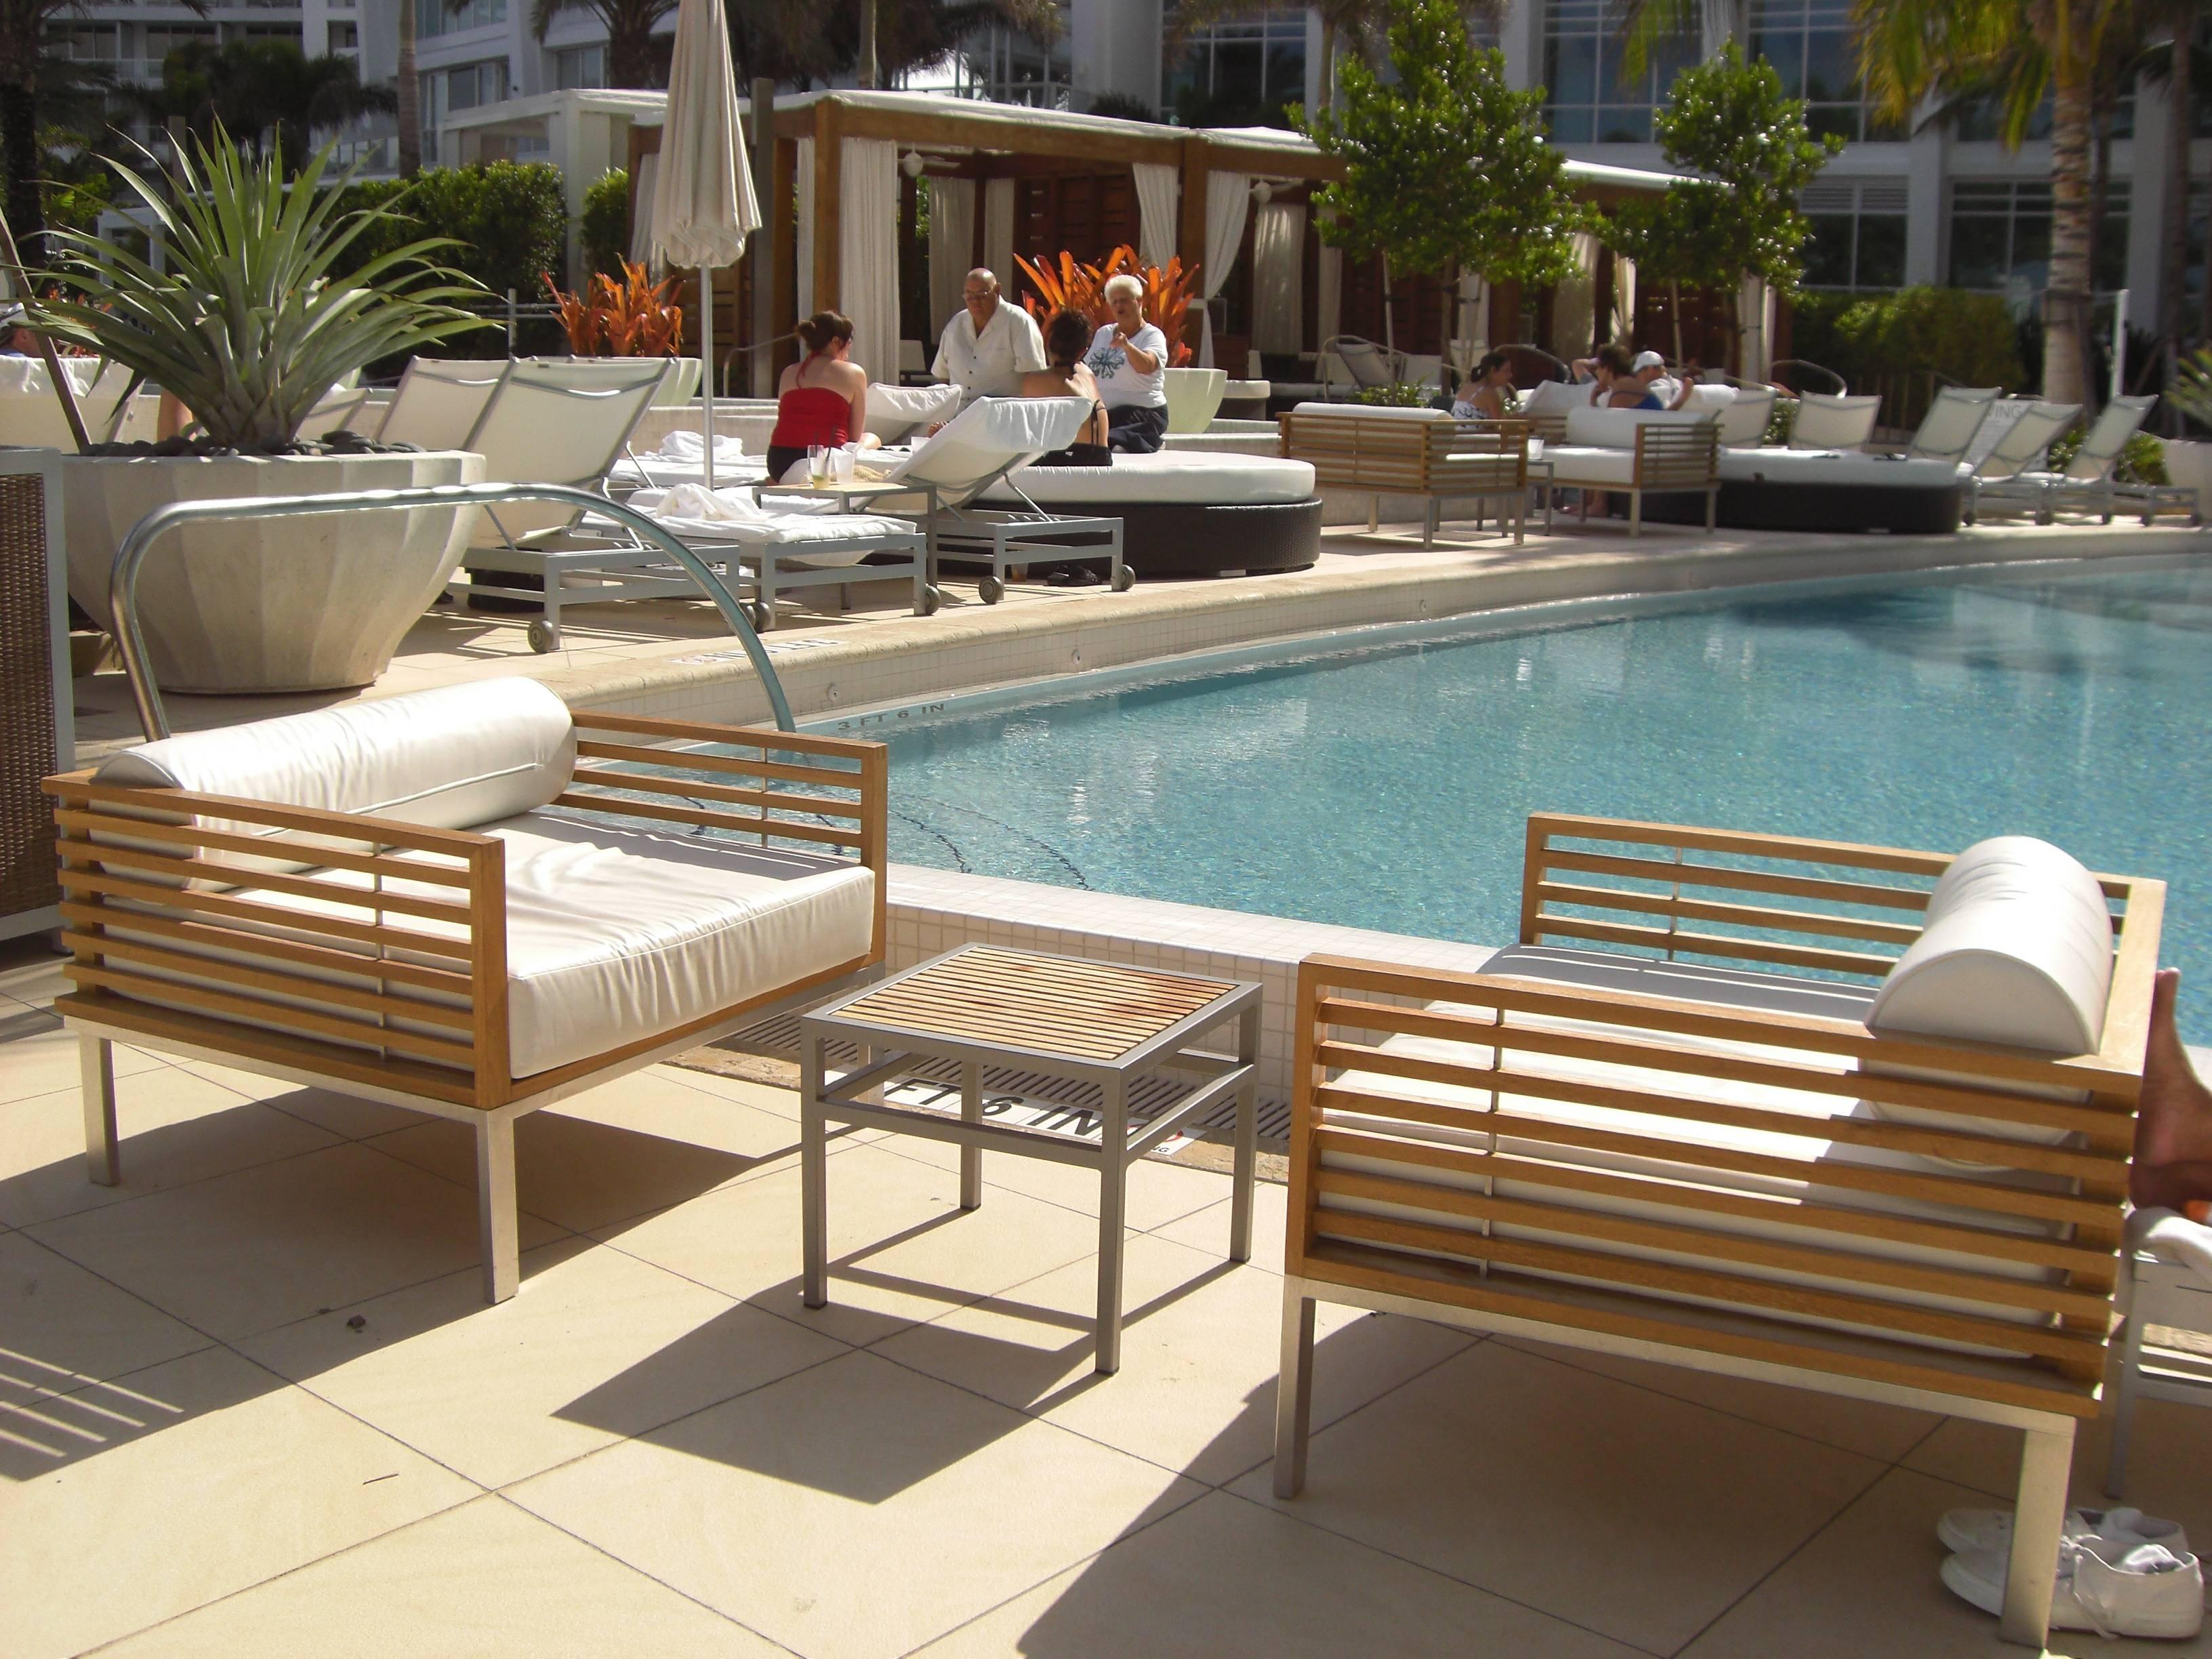 teak outdoor furniture teak furniture UECGLSB